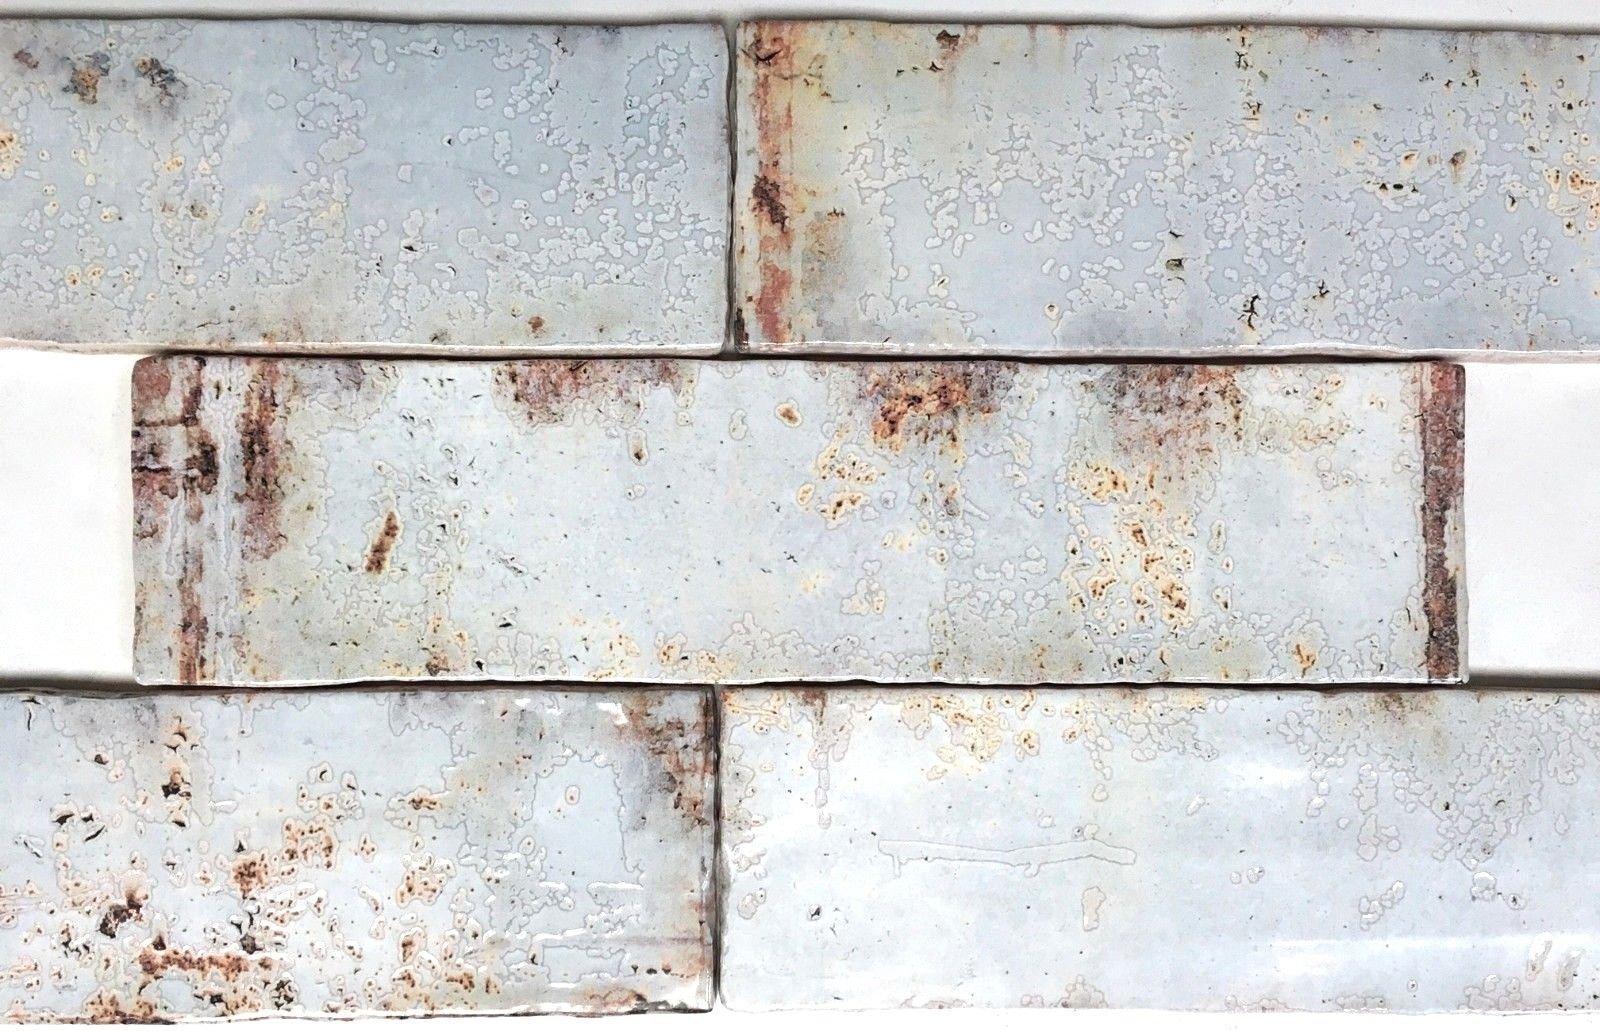 3x12 Palermo Collection Aires Glazed Ceramic Tile Backsplash Decor Wall Bath (1sf, 4pcs) by Squarefeet Depot